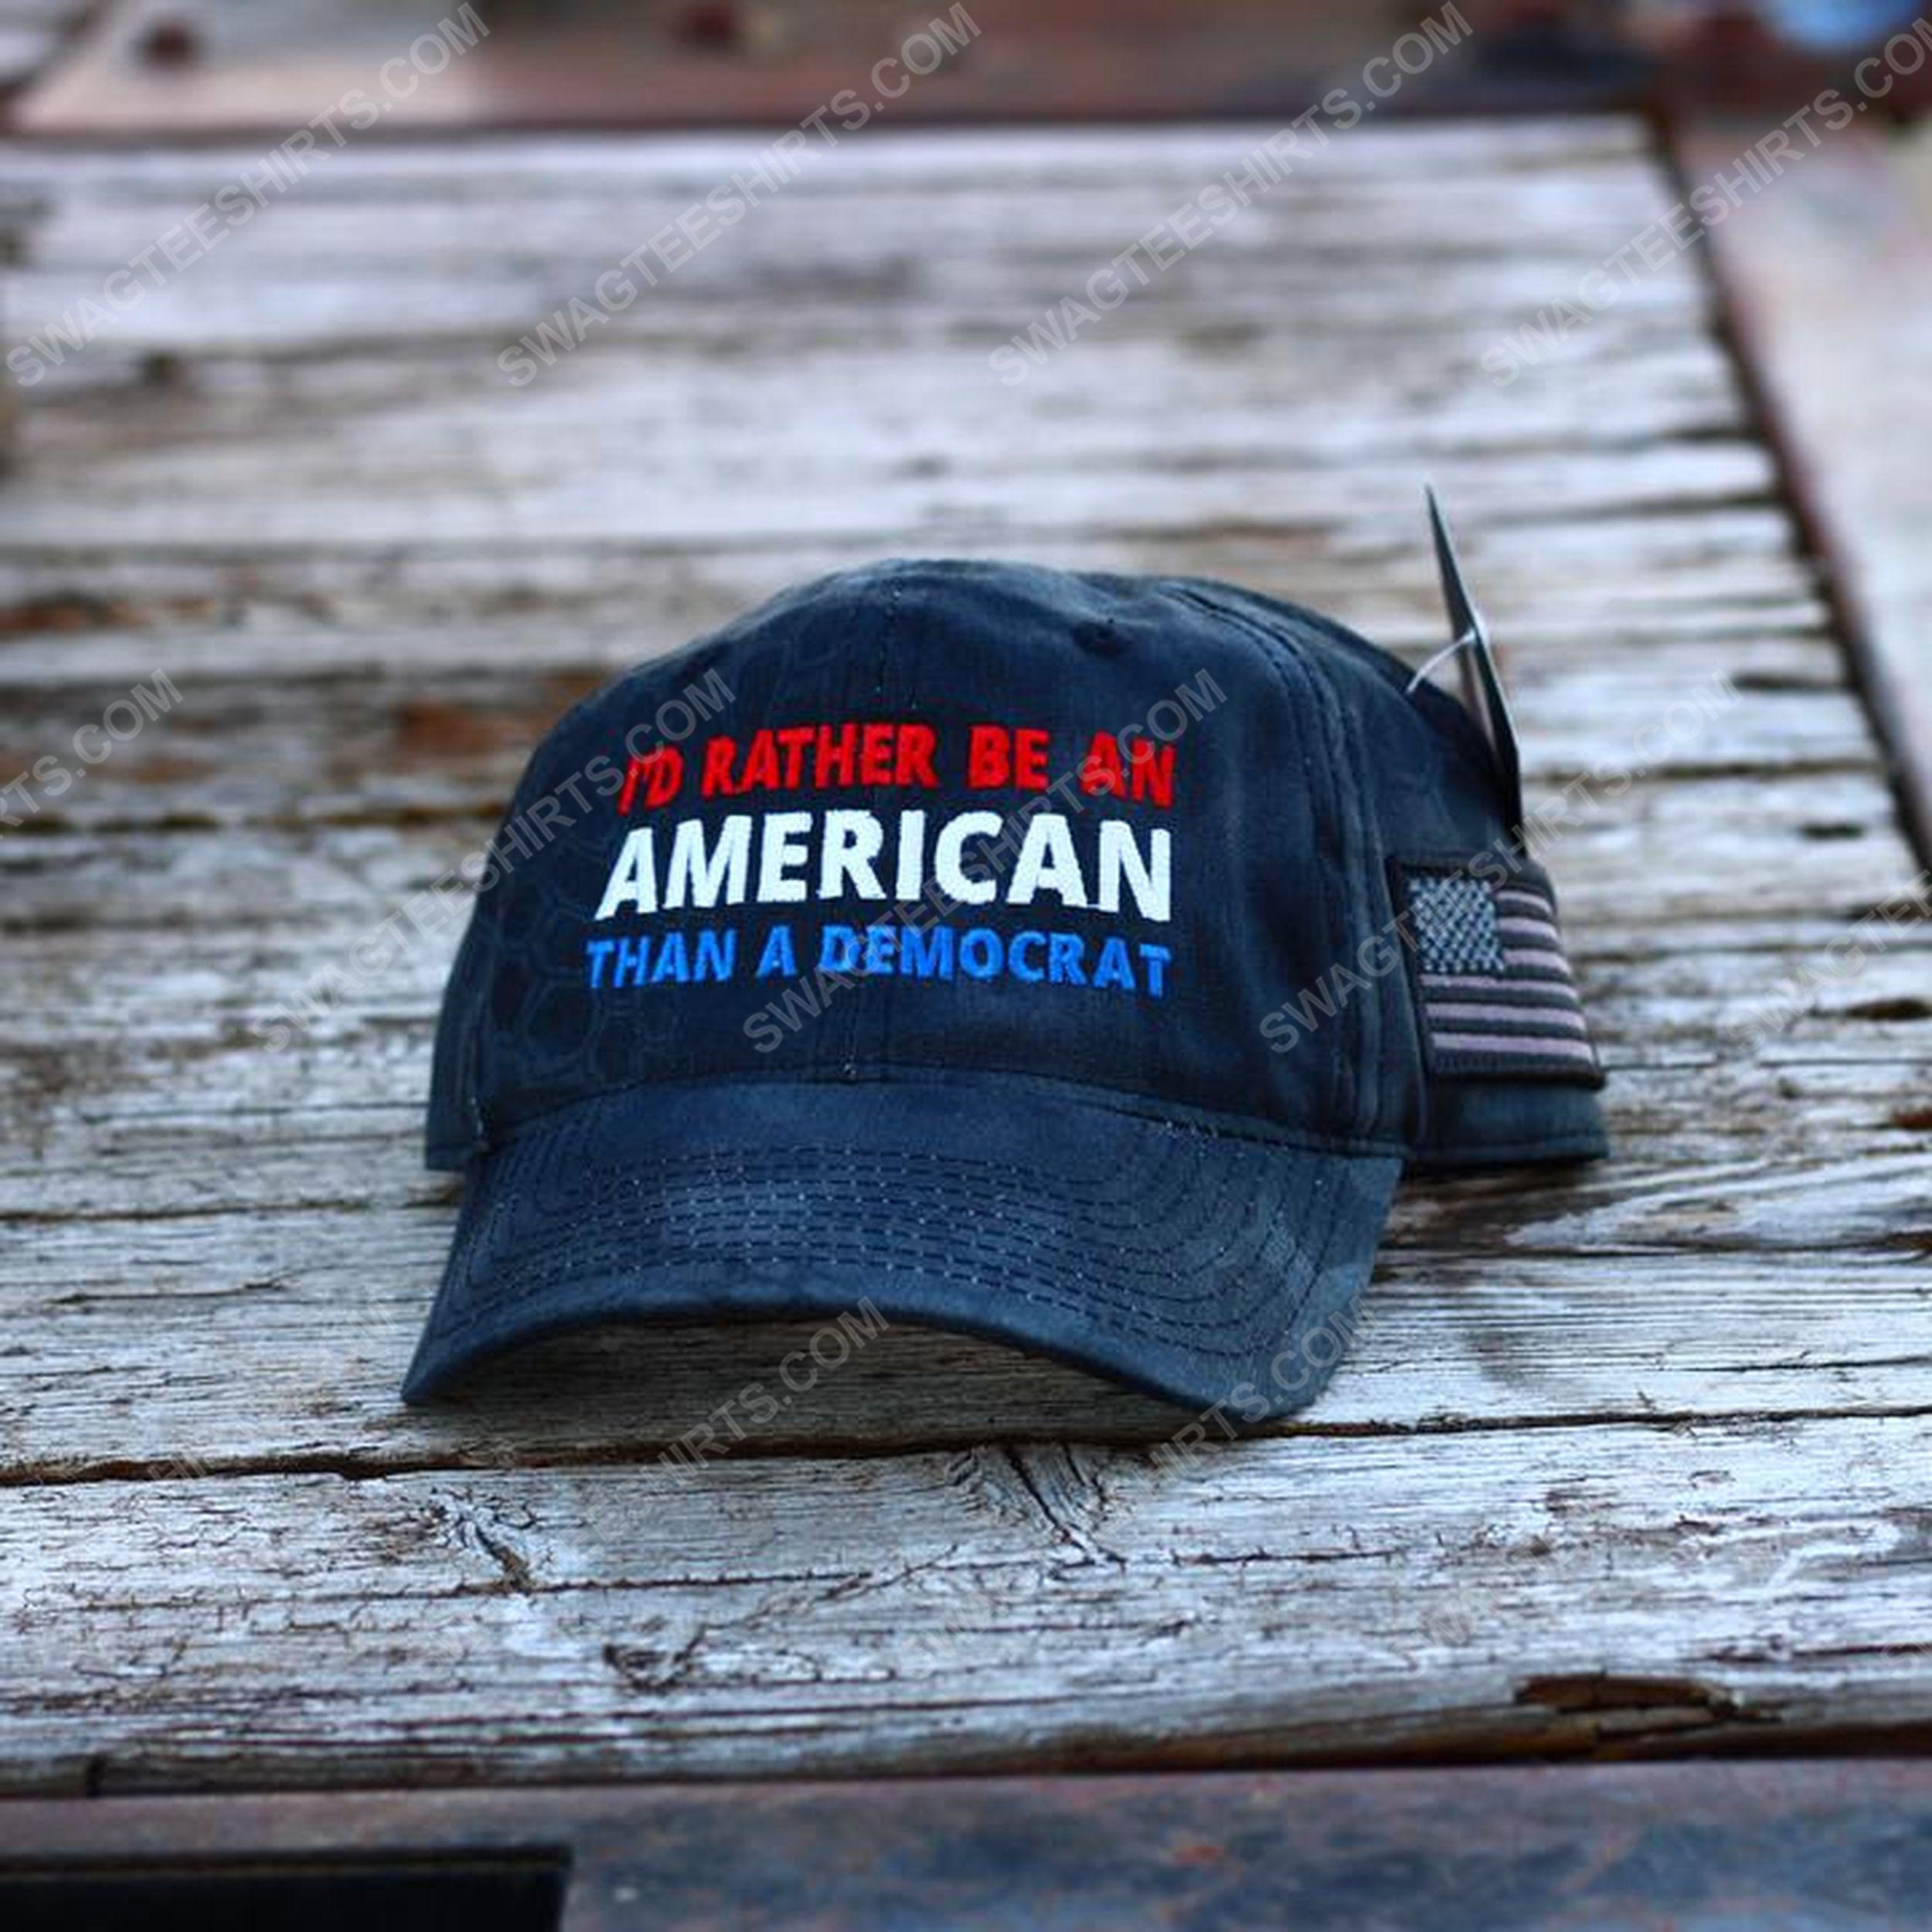 I'd rather be an american than a democrat full print classic hat 1 - Copy (3)